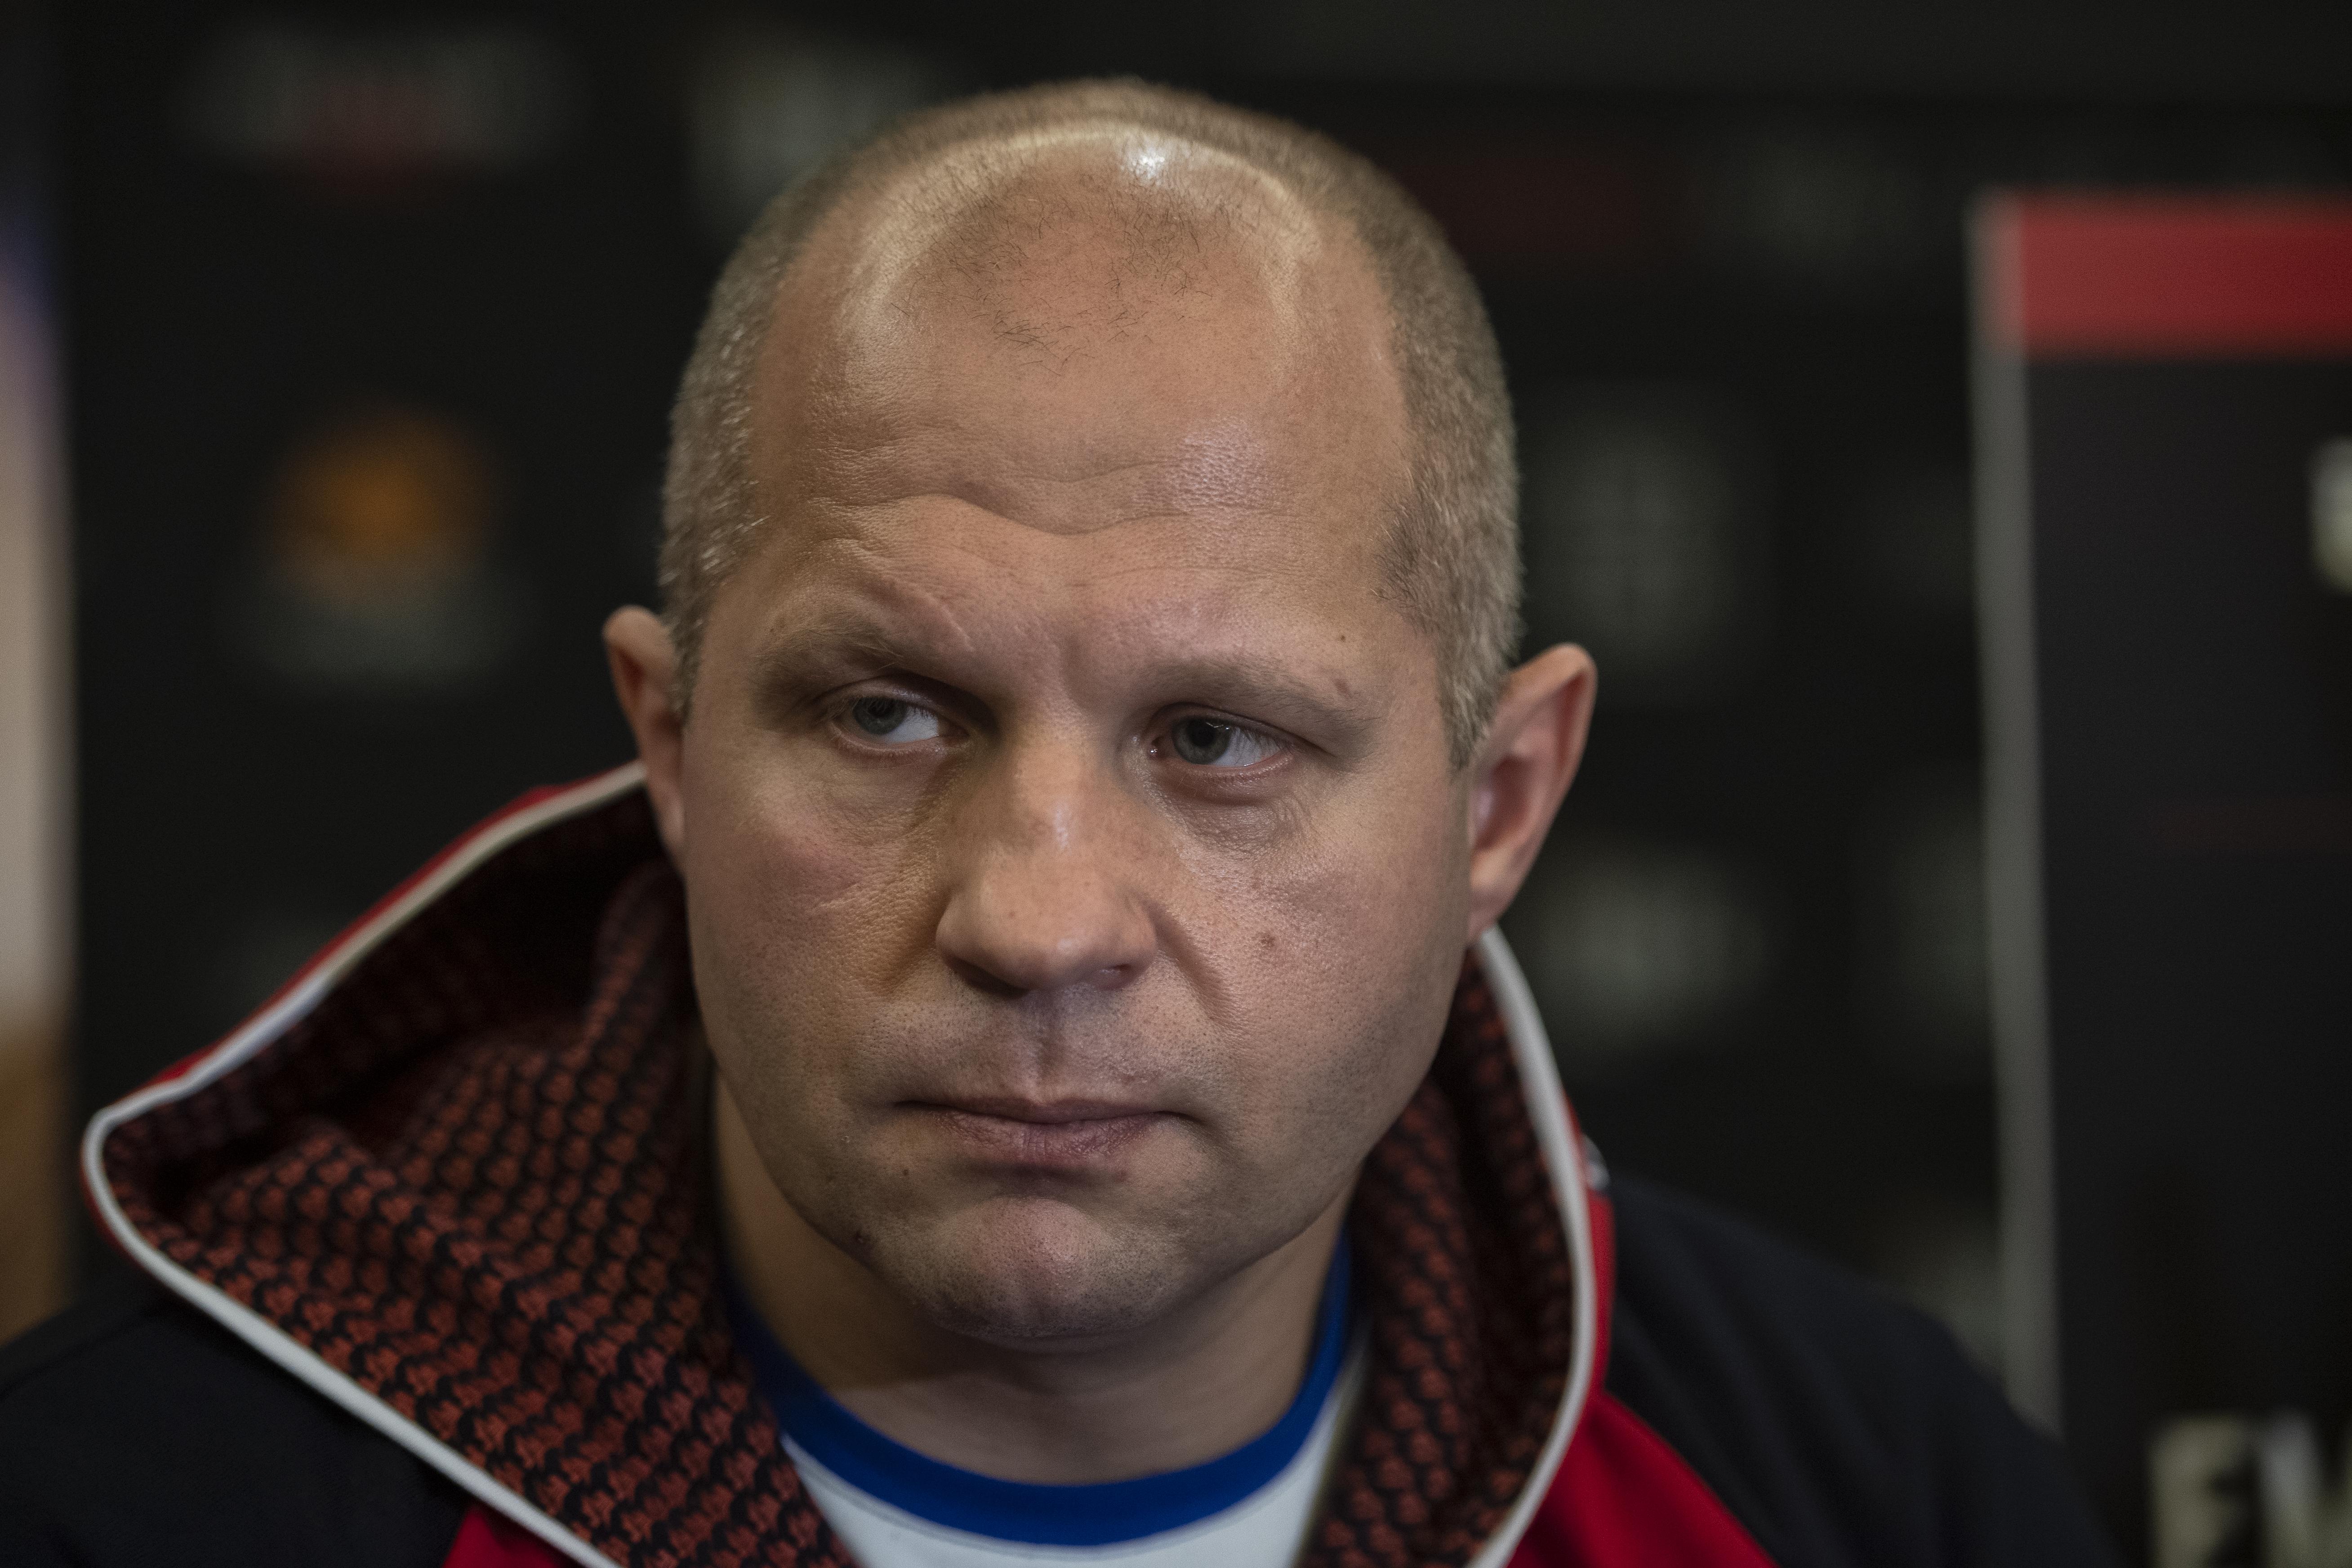 Fedor Emelianenko has strong words for UFC president Dana White